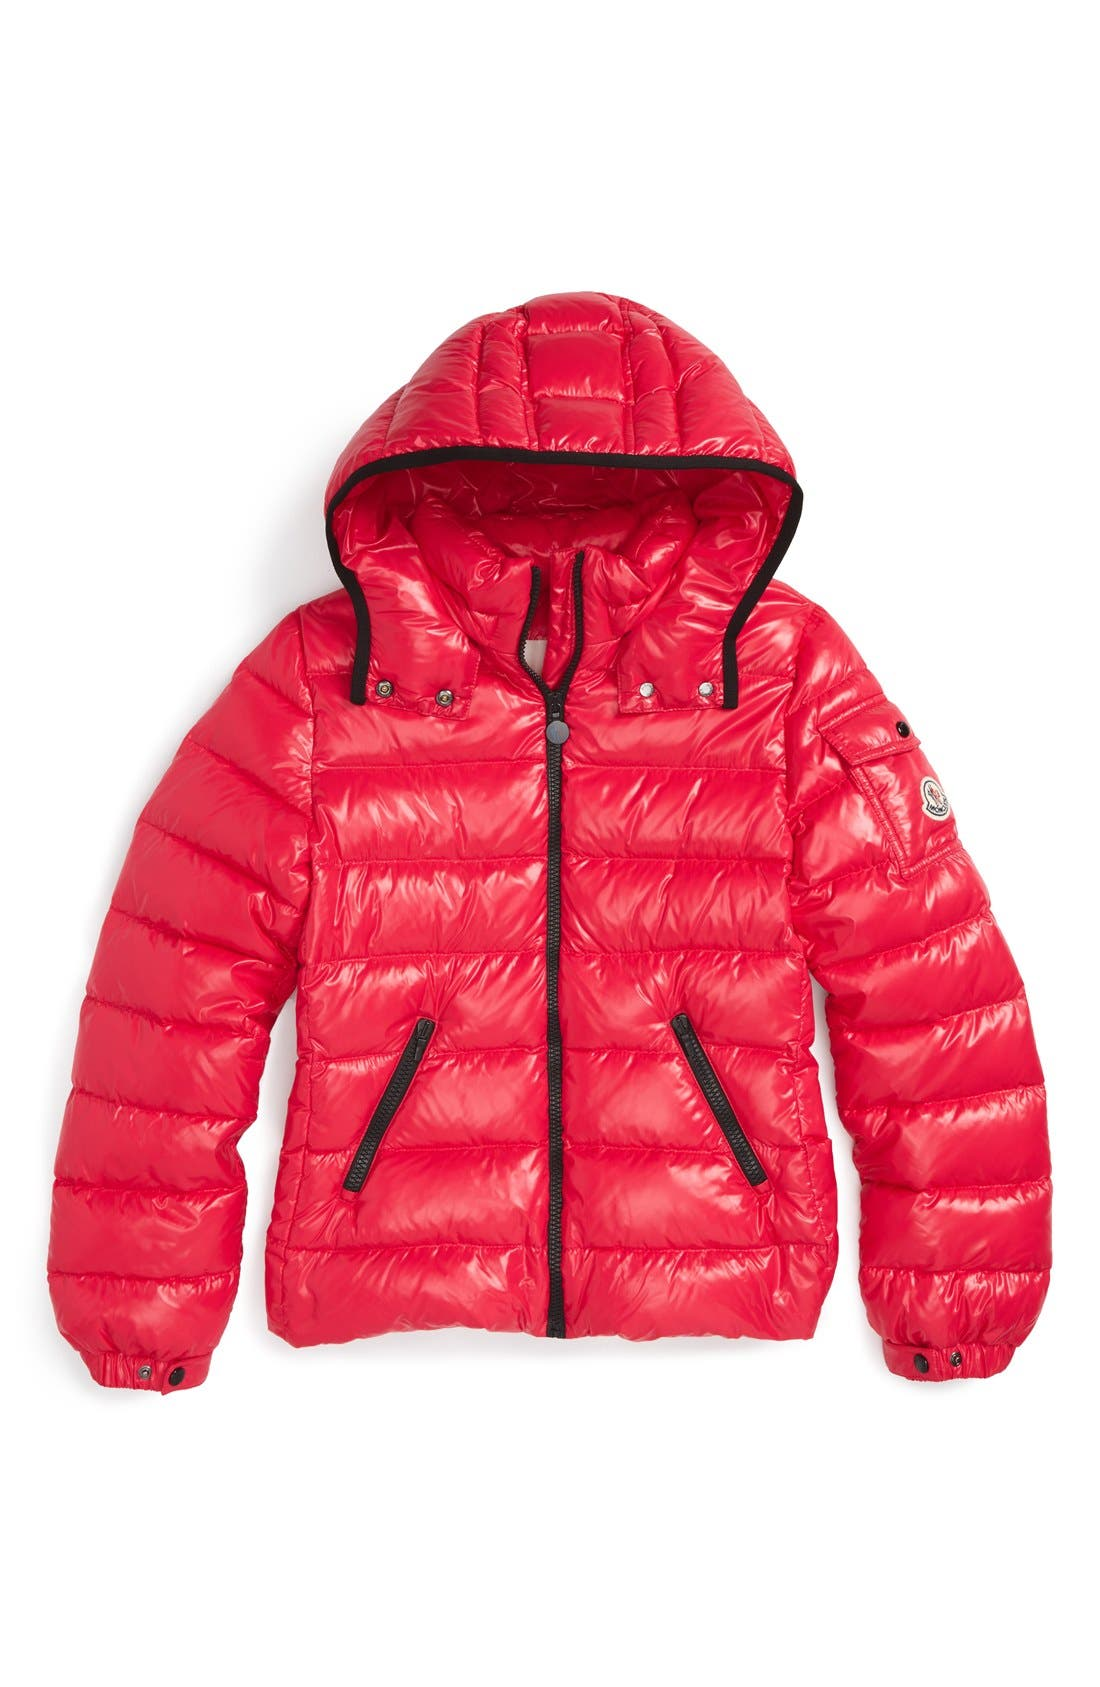 Main Image - Moncler 'Bady' Hooded Down Jacket (Toddler Girls, Little Girls & Big Girls)